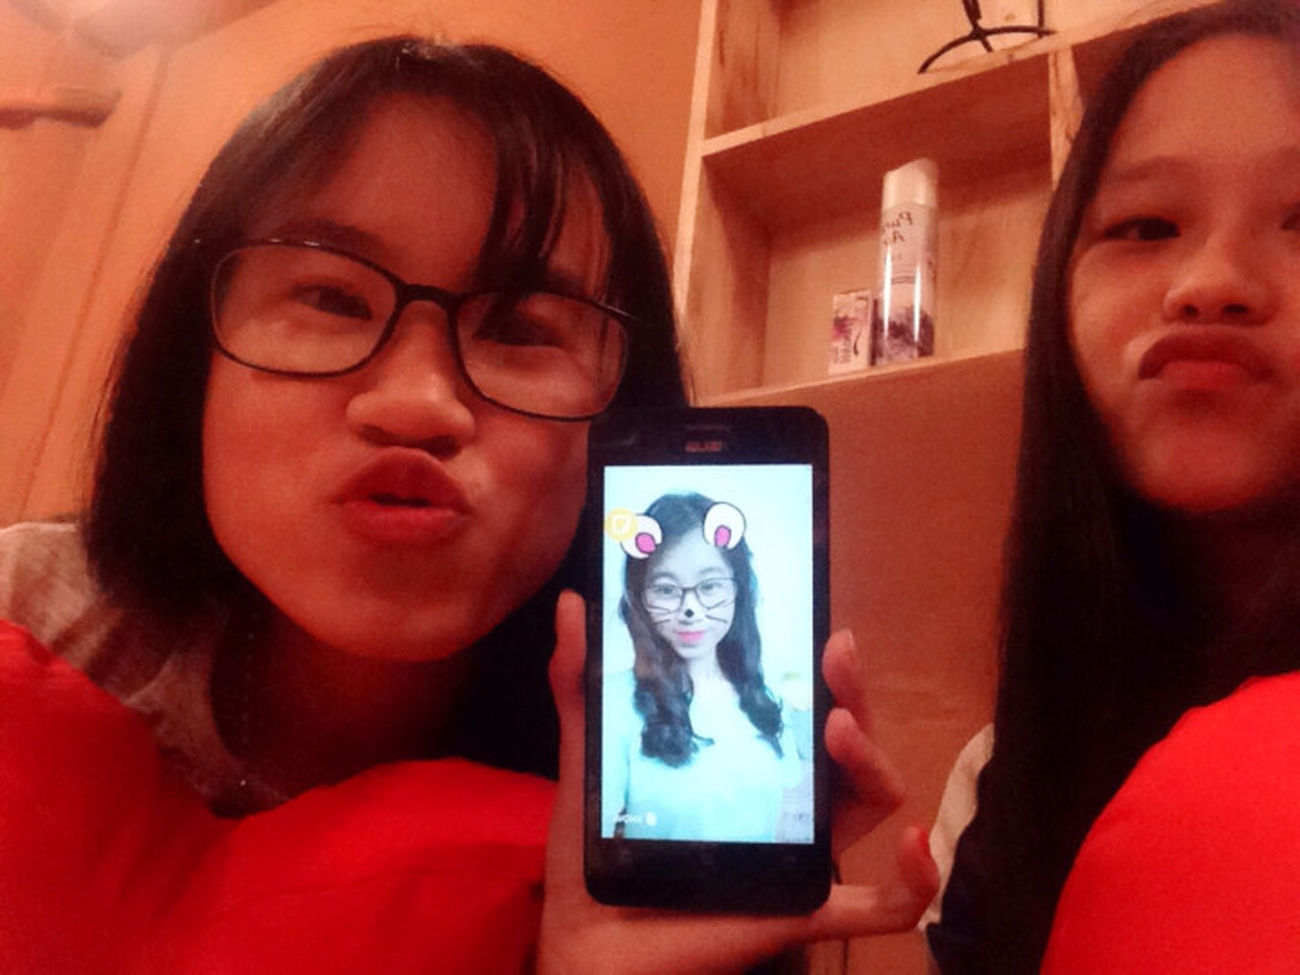 Chụp với HOT GIRL 😱😱😱😱 Be Strong Girl 加油 Beautiful Girls Selfie ✌ Sunday Morning